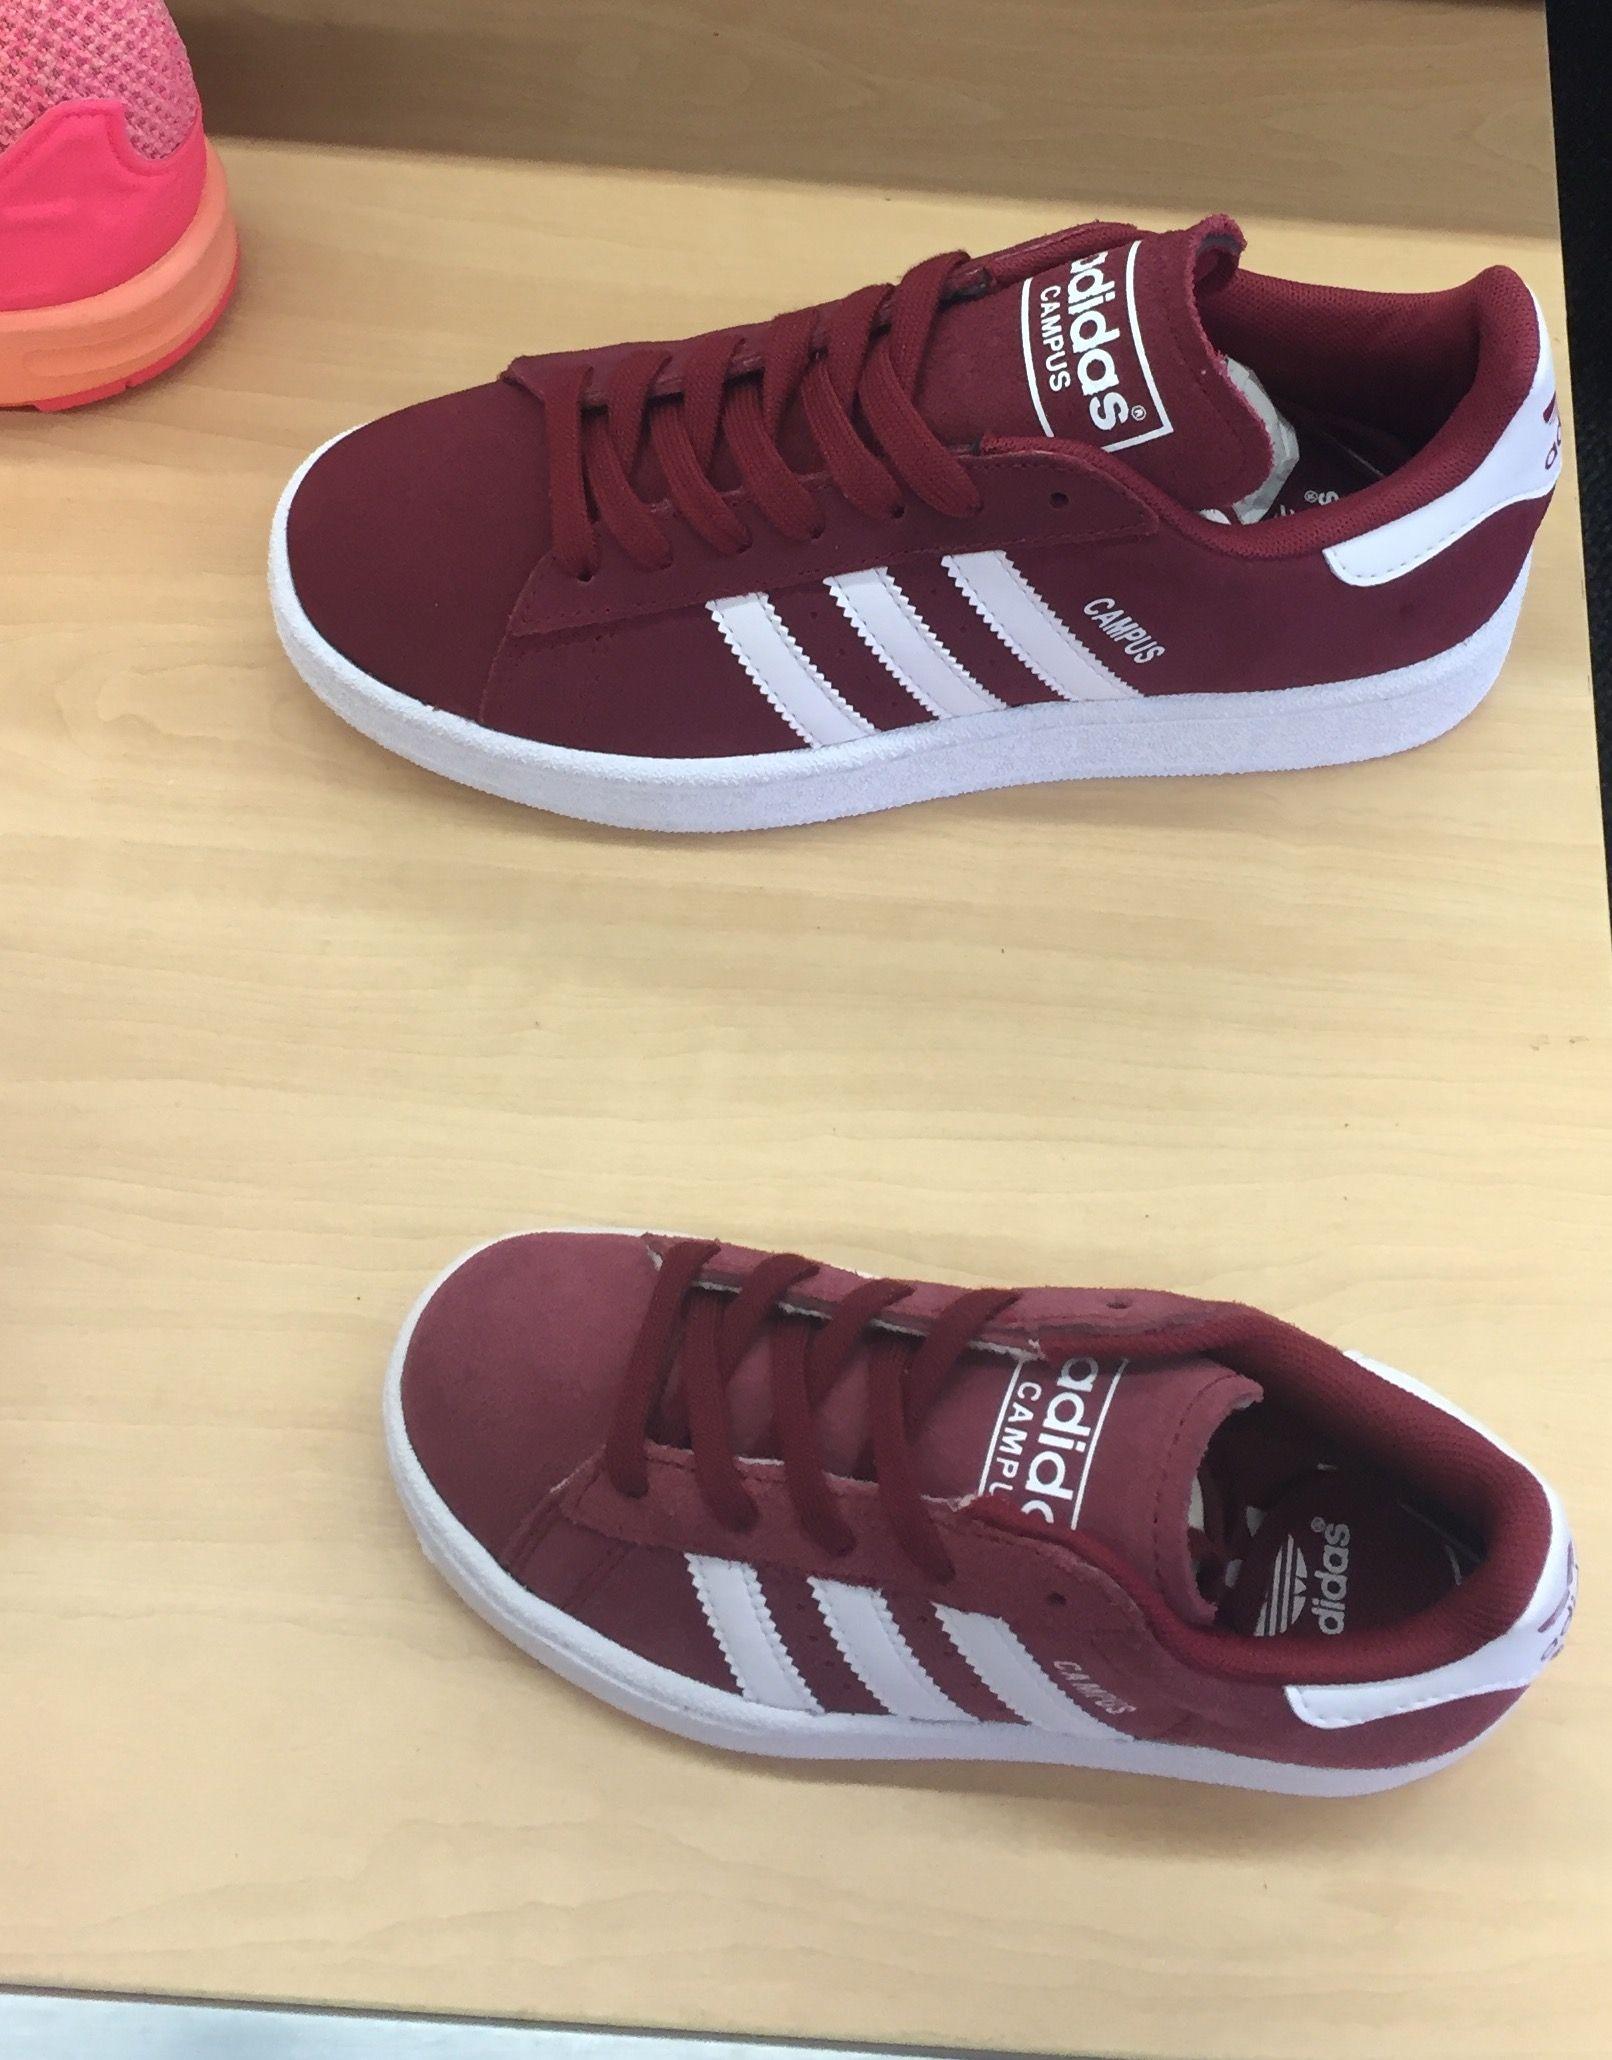 d7569bed1 burgundy adidas superstars